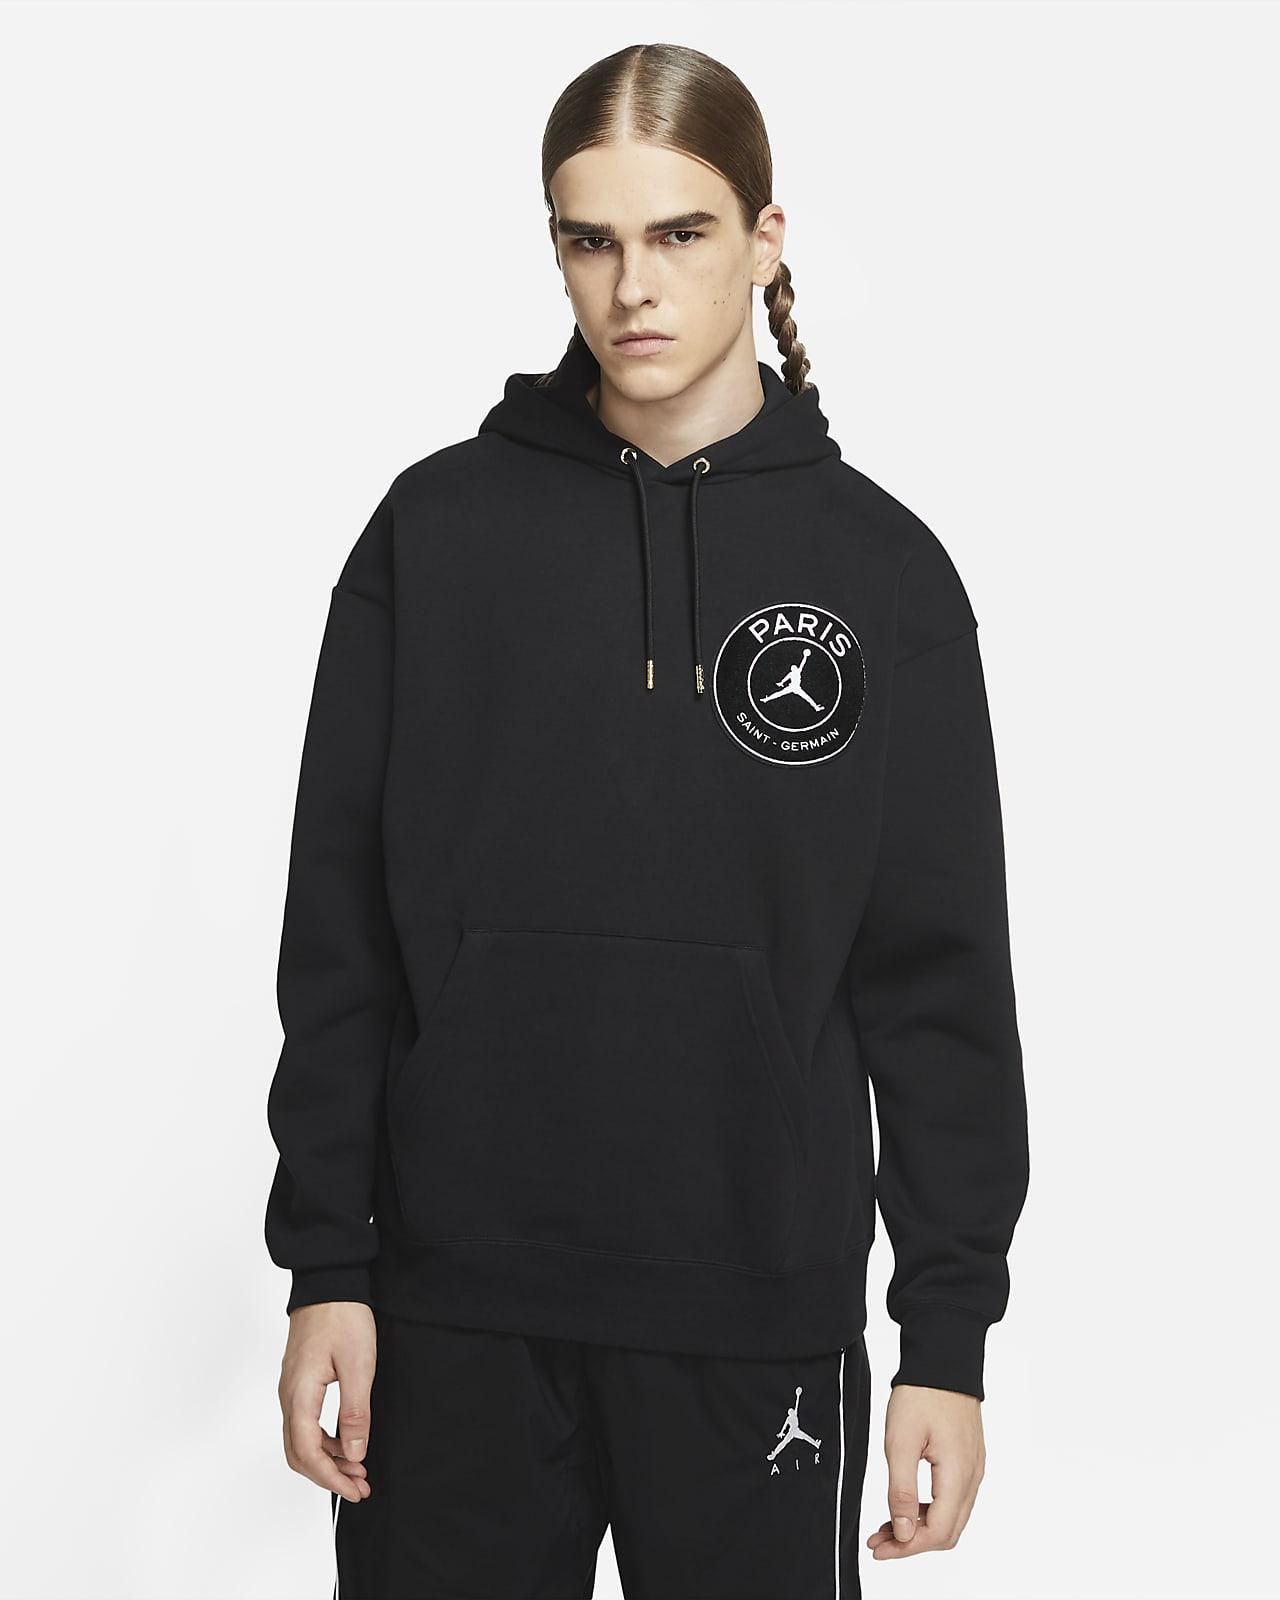 Dar permiso Mujer Marcha mala  Paris Saint-Germain Men's Taped Pullover Hoodie. Nike AU